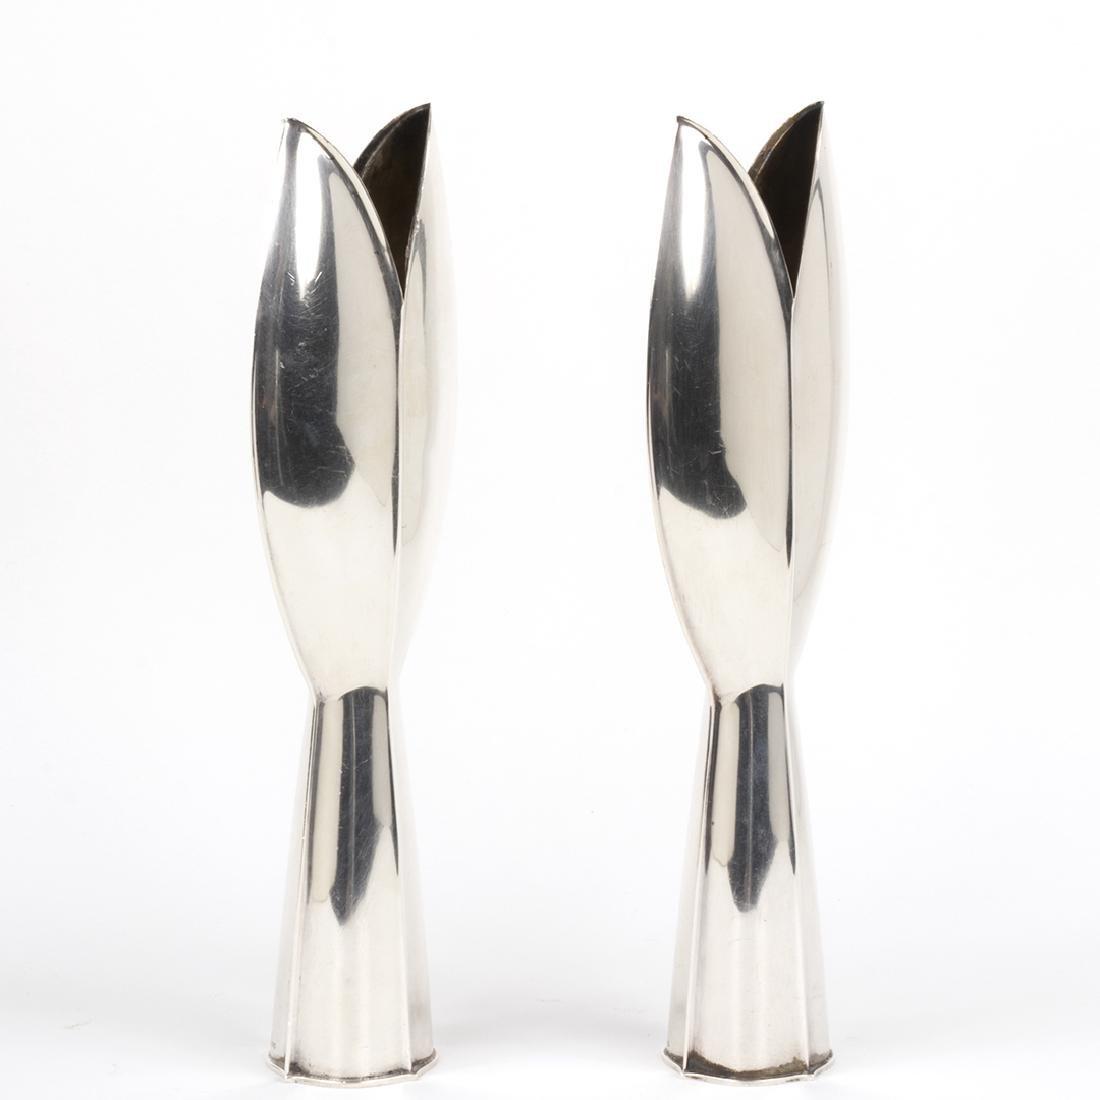 Tapio Wirkkala Sterling Silver Vases (2) - 2